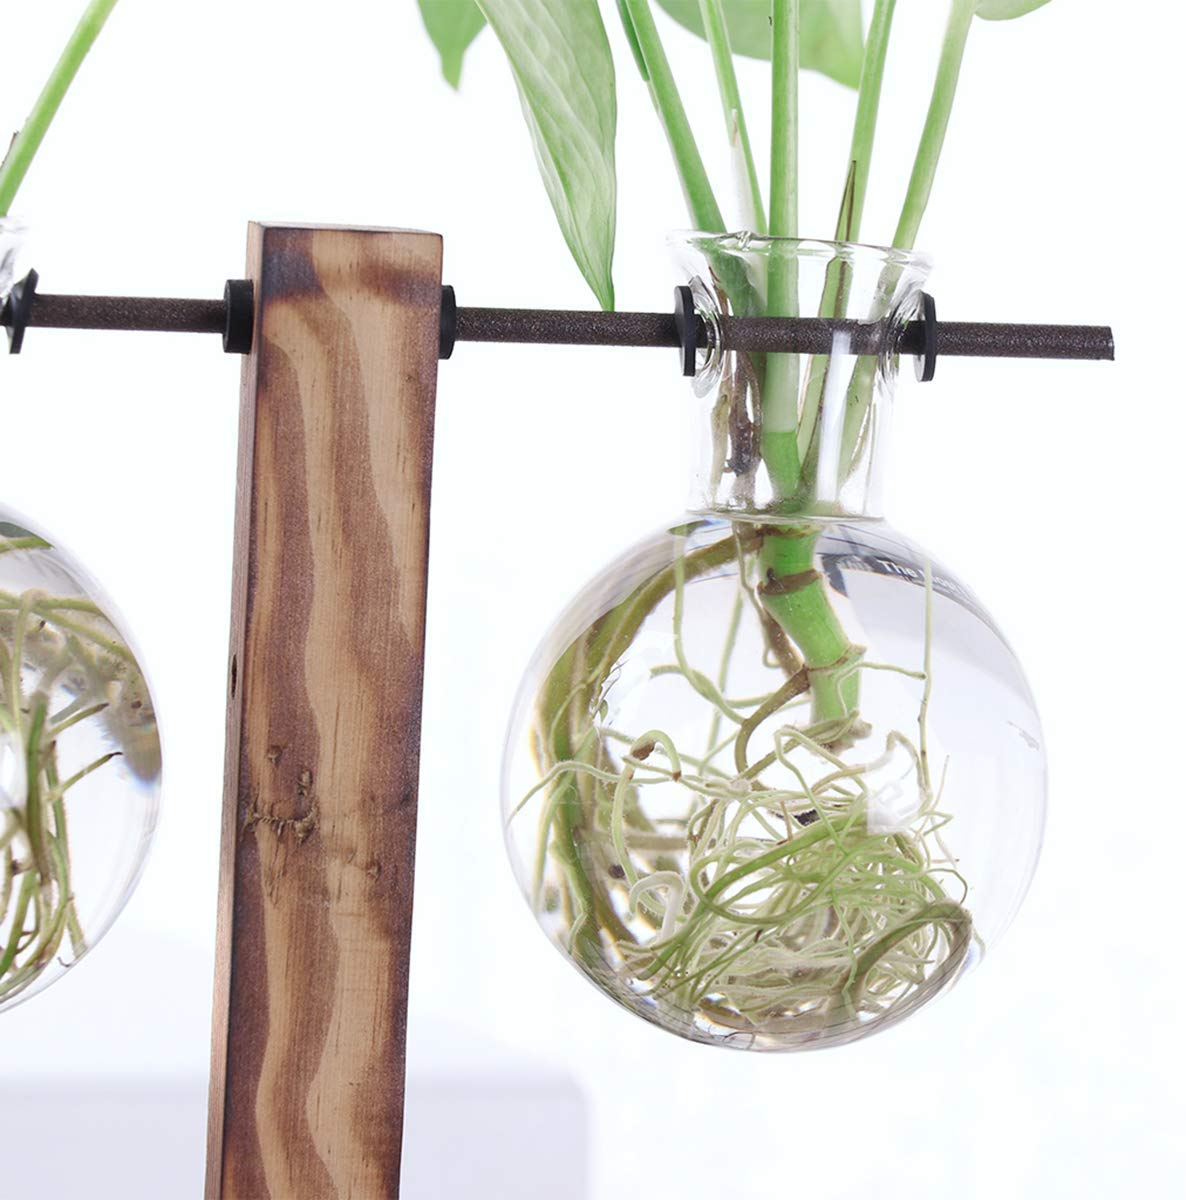 Creative-vase-plant-glass-hydroponic-container-farm-decorative-flowerpot-ho-S1A4